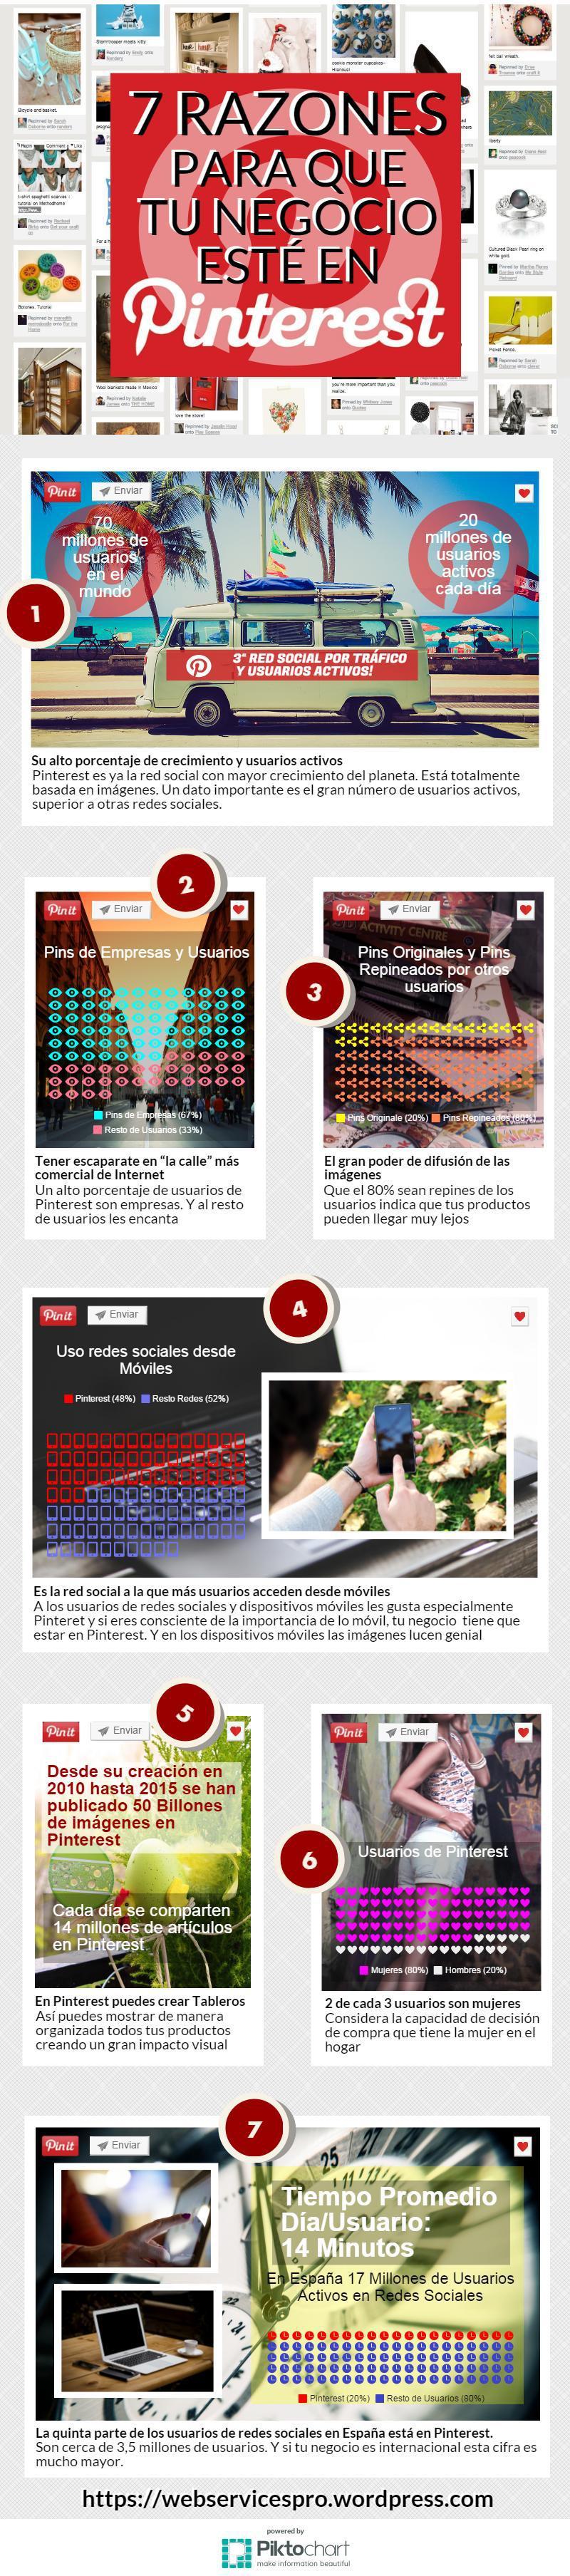 7 razones para que tu empresa esté en Pinterest